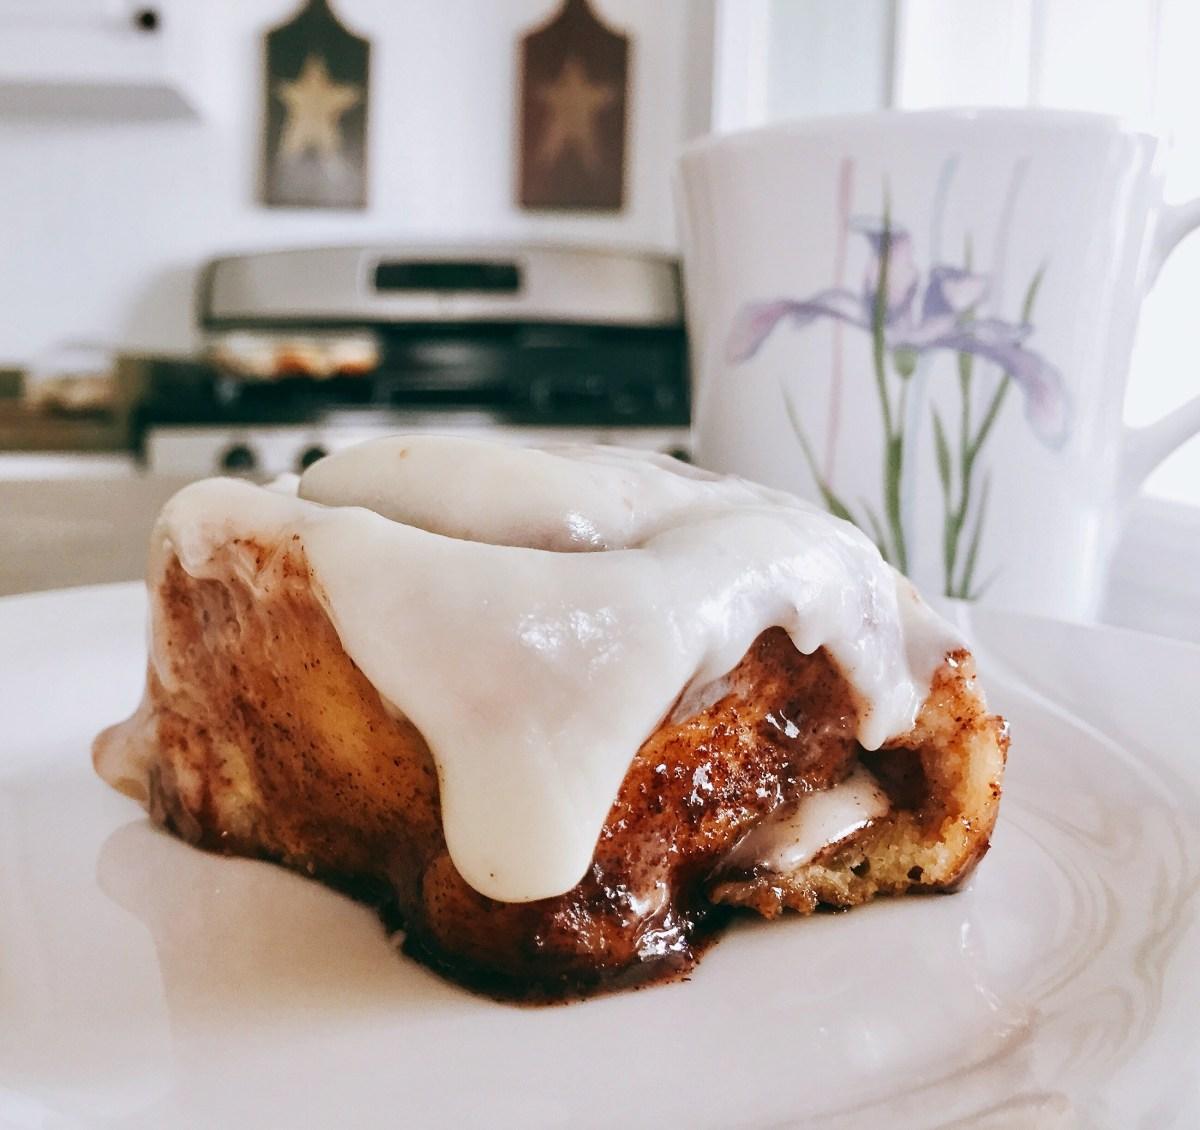 Big, Fat, Ooey, Gooey Cinnamon Buns by happylifeblogspot.com #cinnamonbuns #creamcheesefrosting #cinnamonrolls #cinnamon